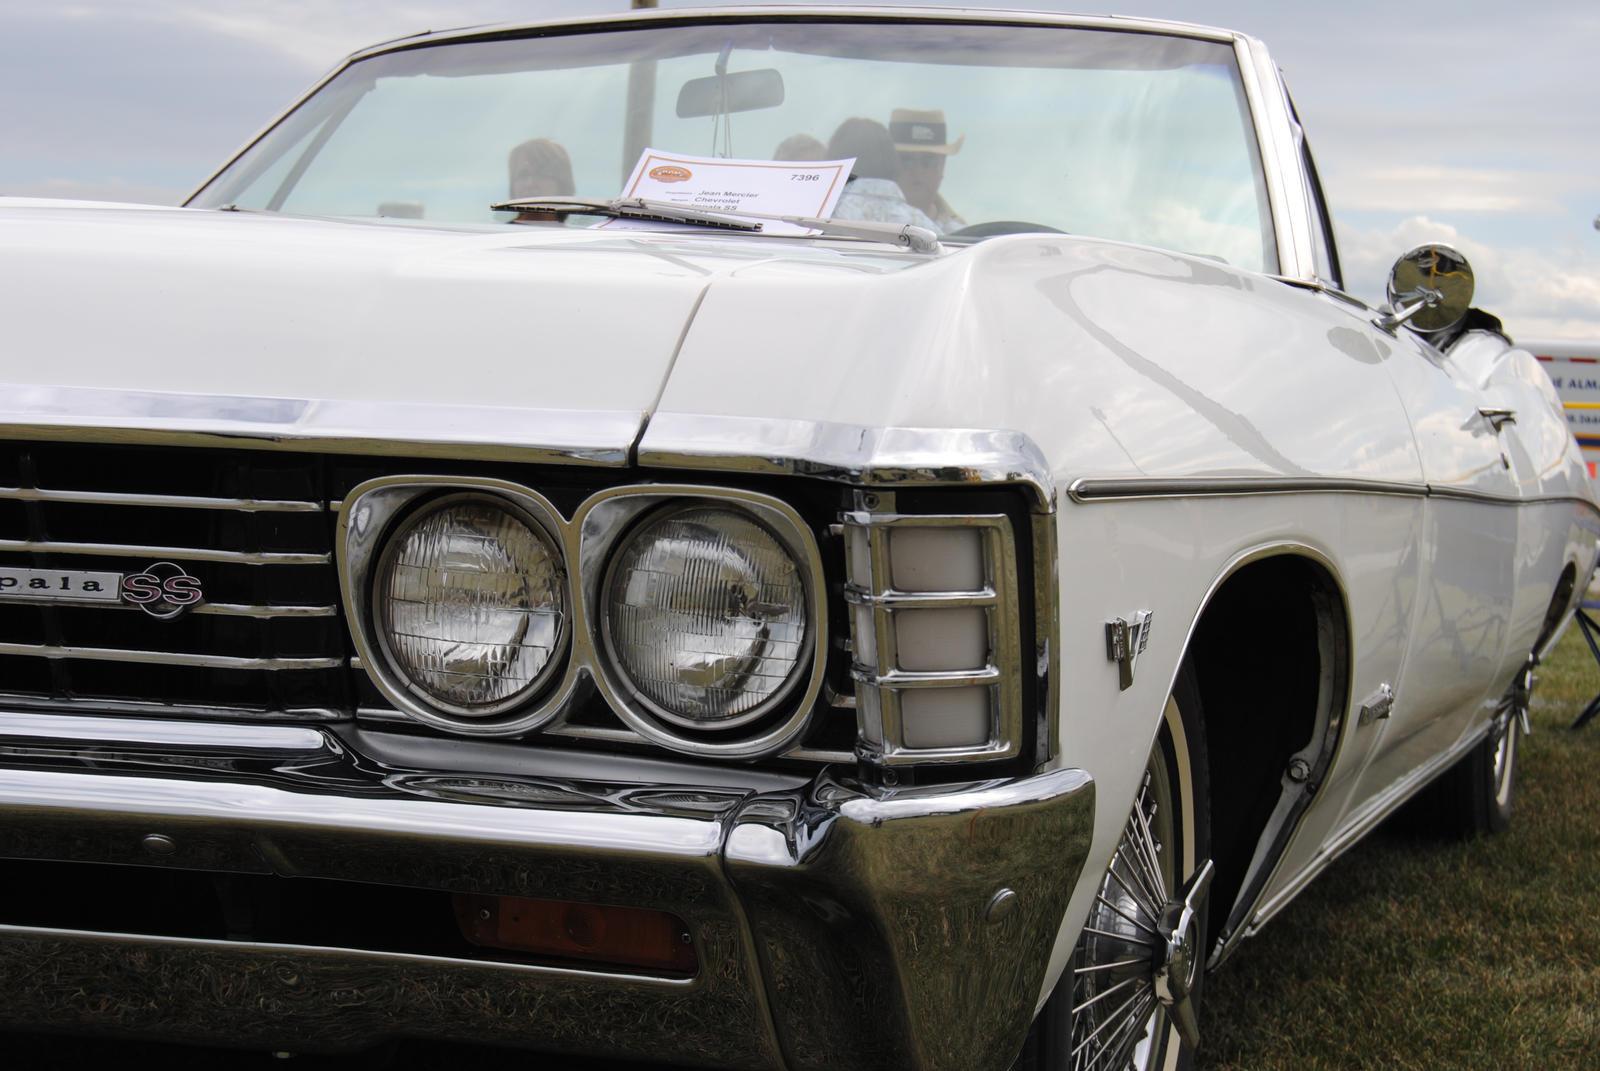 Impala 1967 chevy impala 4 door hardtop for sale : 1967 Chevy Impala SS by The-Emard on DeviantArt